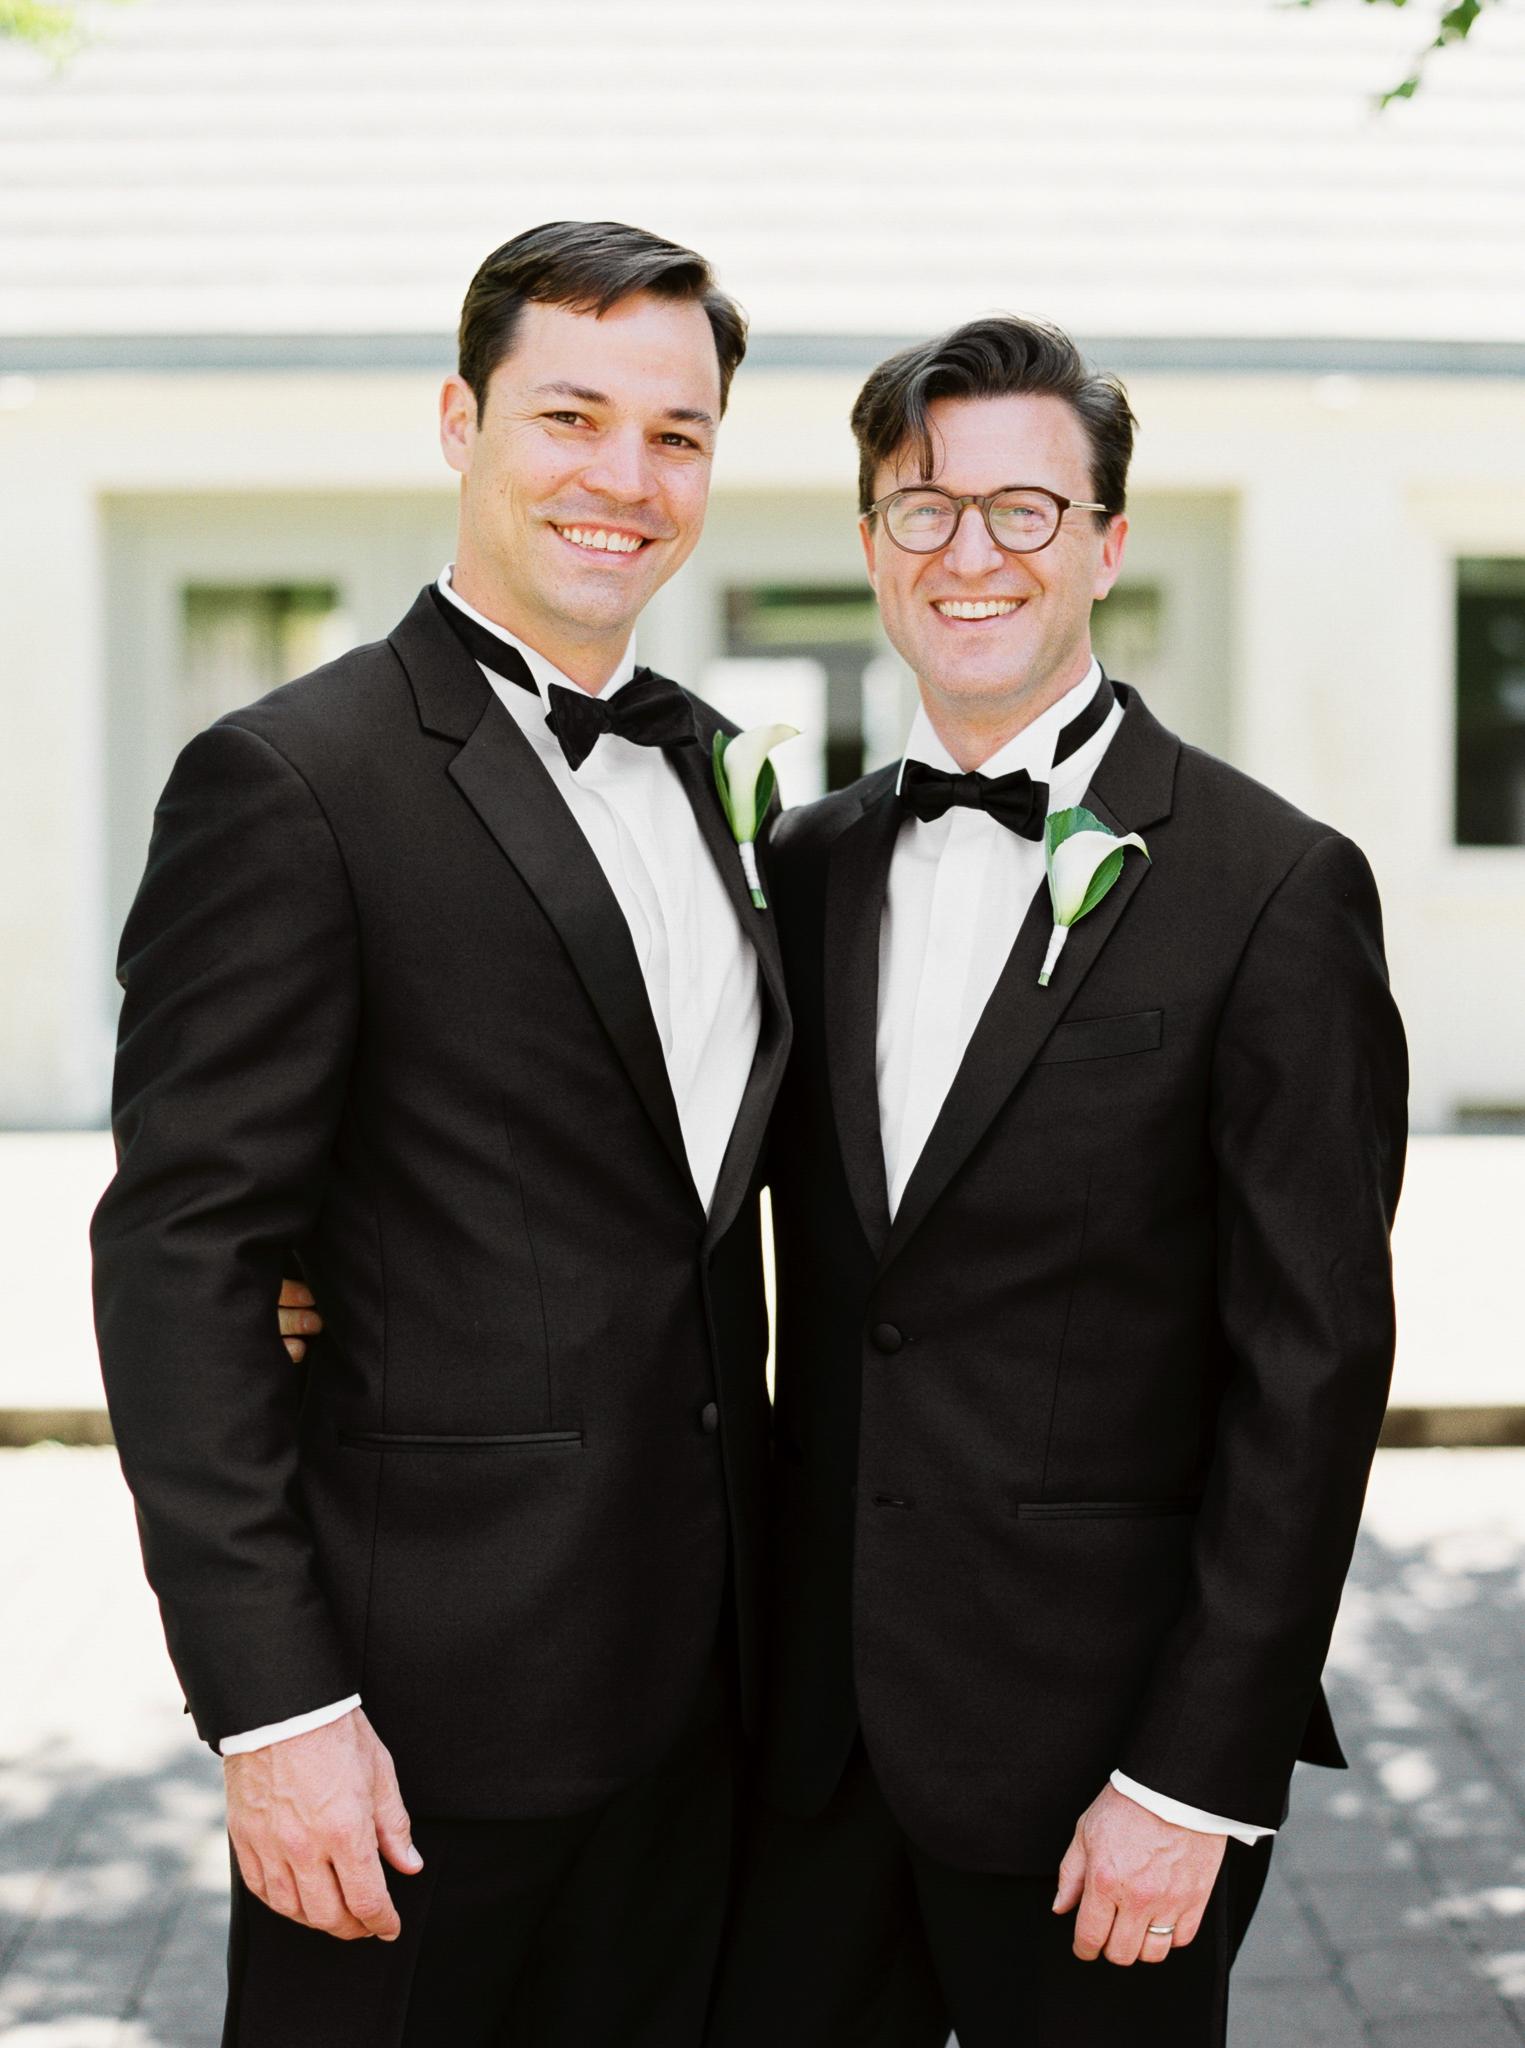 063OutliveCreative_Travel_Photographer_Videographer_Lewis&Clark_Oregon_Elegant_BlackTie_Destination_Wedding.jpg